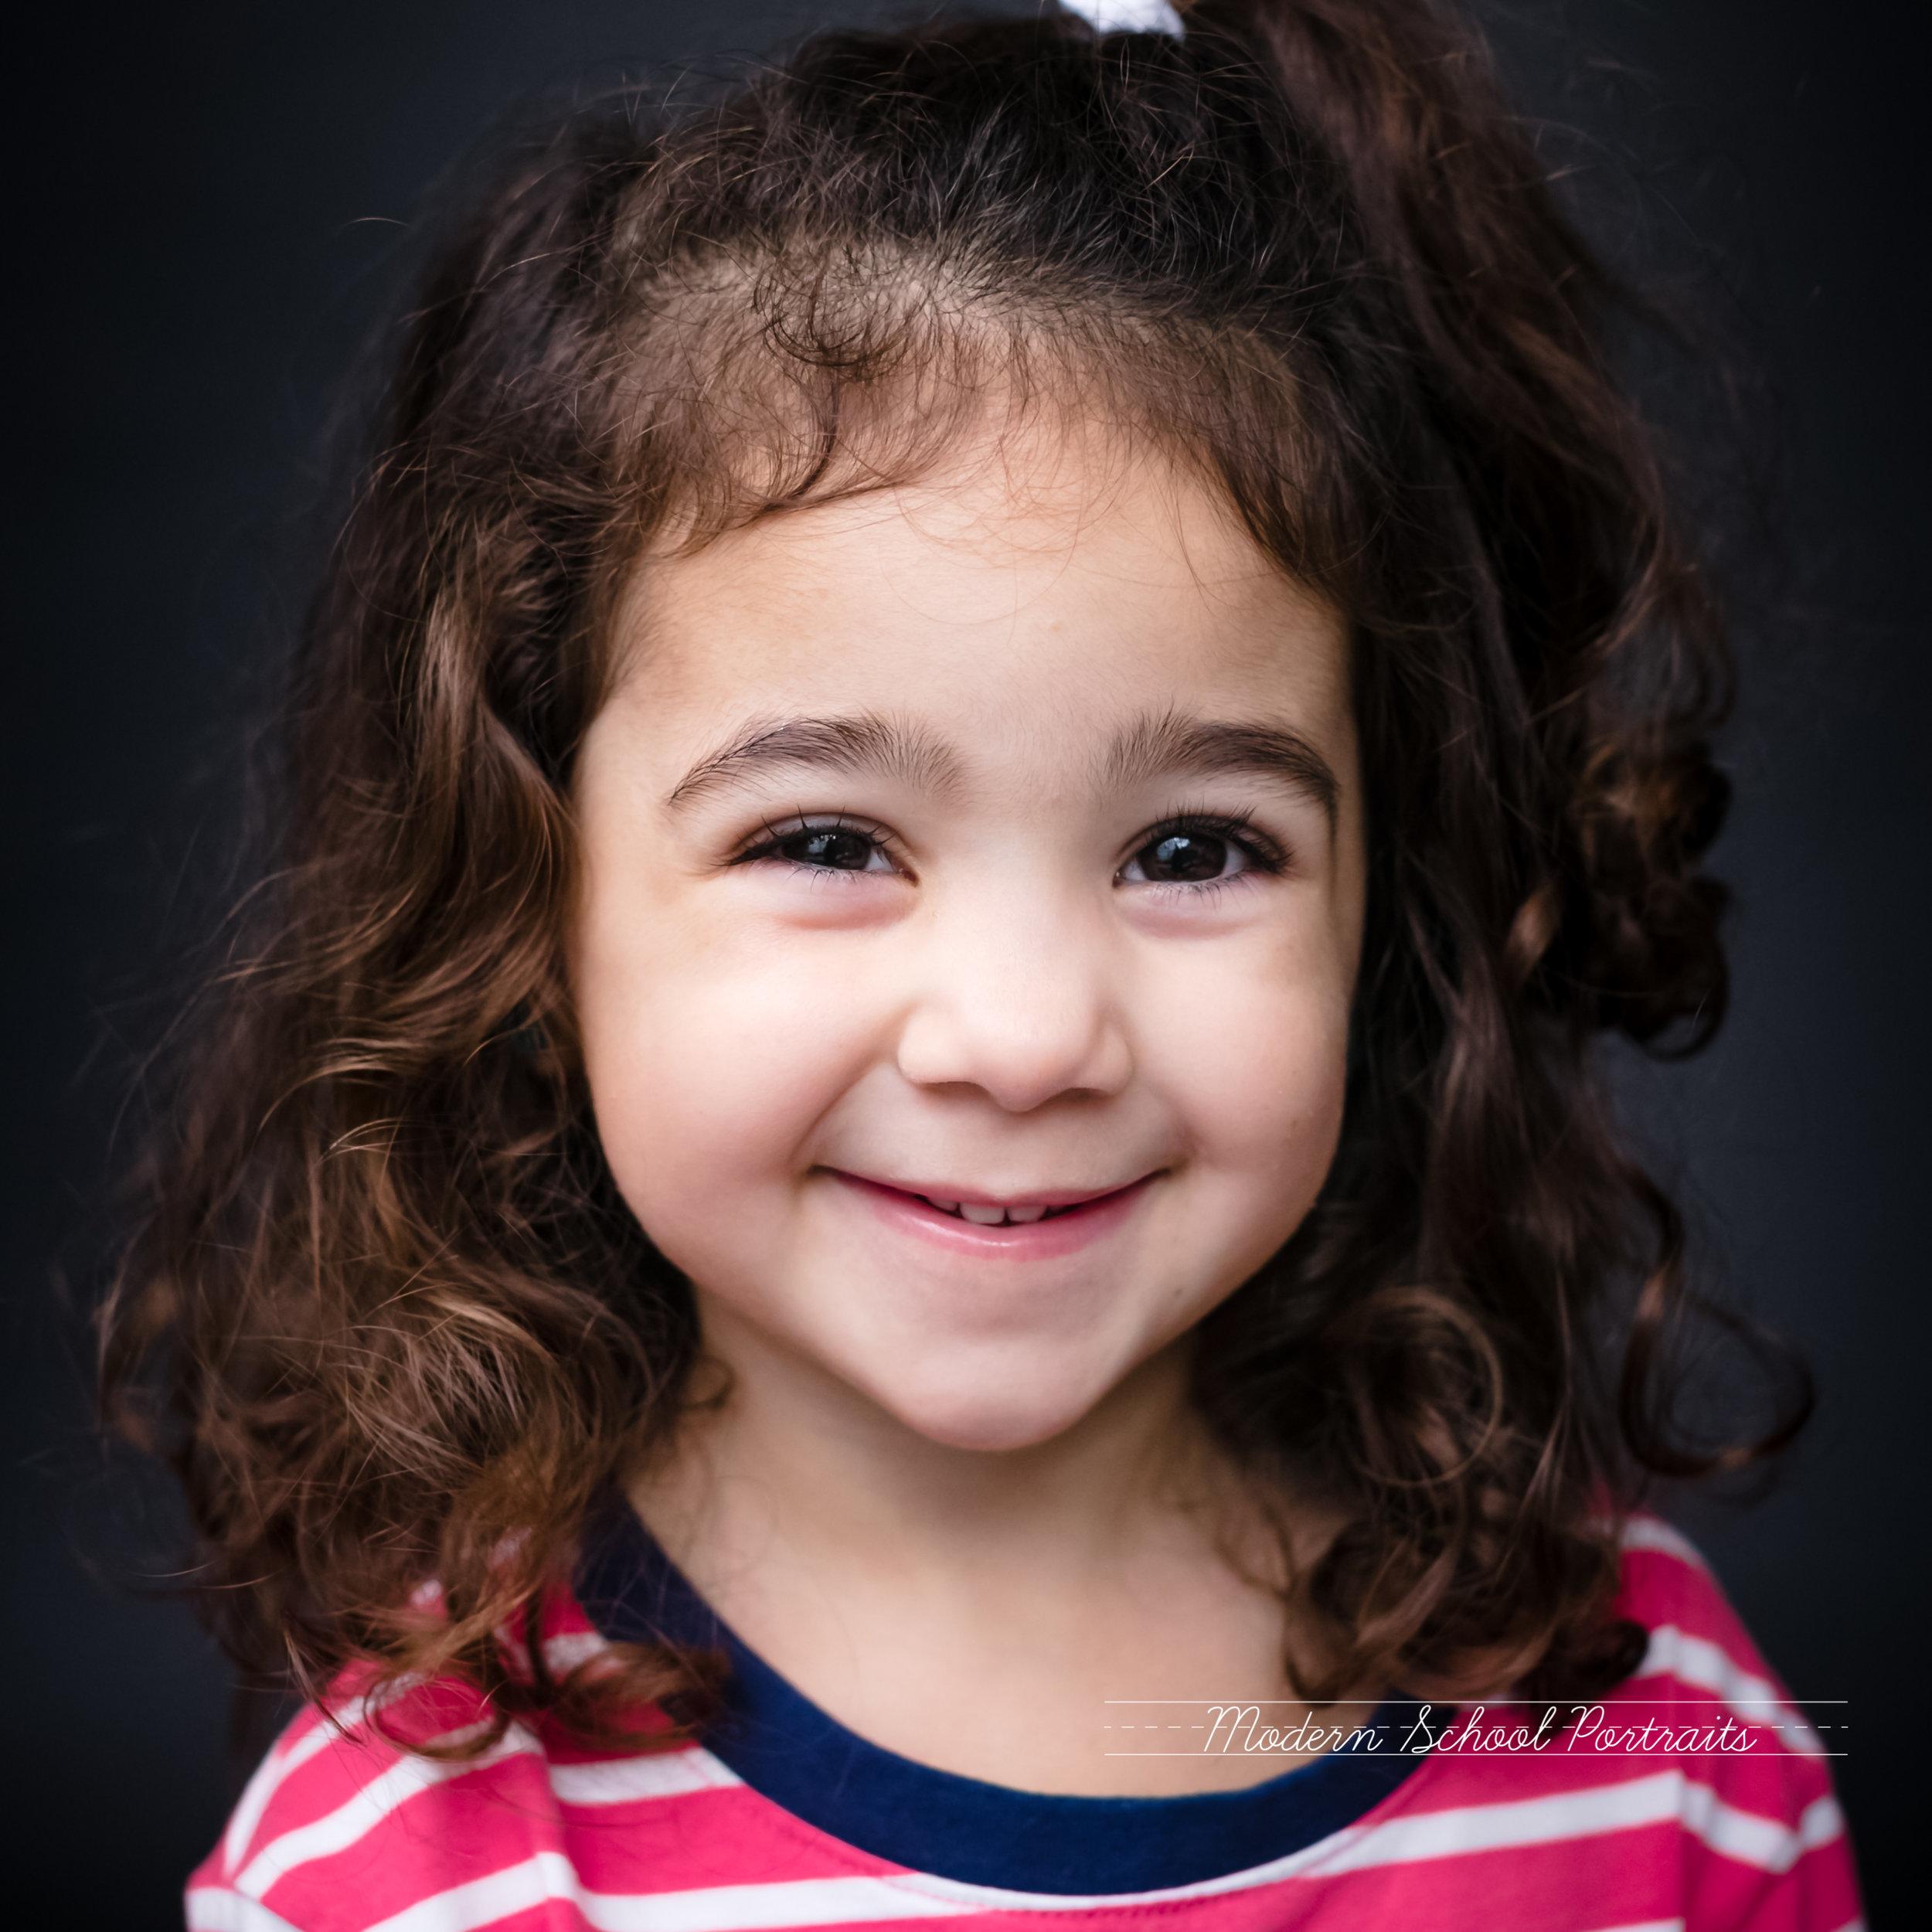 CHICAGO MODERN SCHOOL PORTRAITS PRESCHOOL HISPANIC TODDLER CURLY HAIR GIRL FINE ART PICTURE DAY.jpg